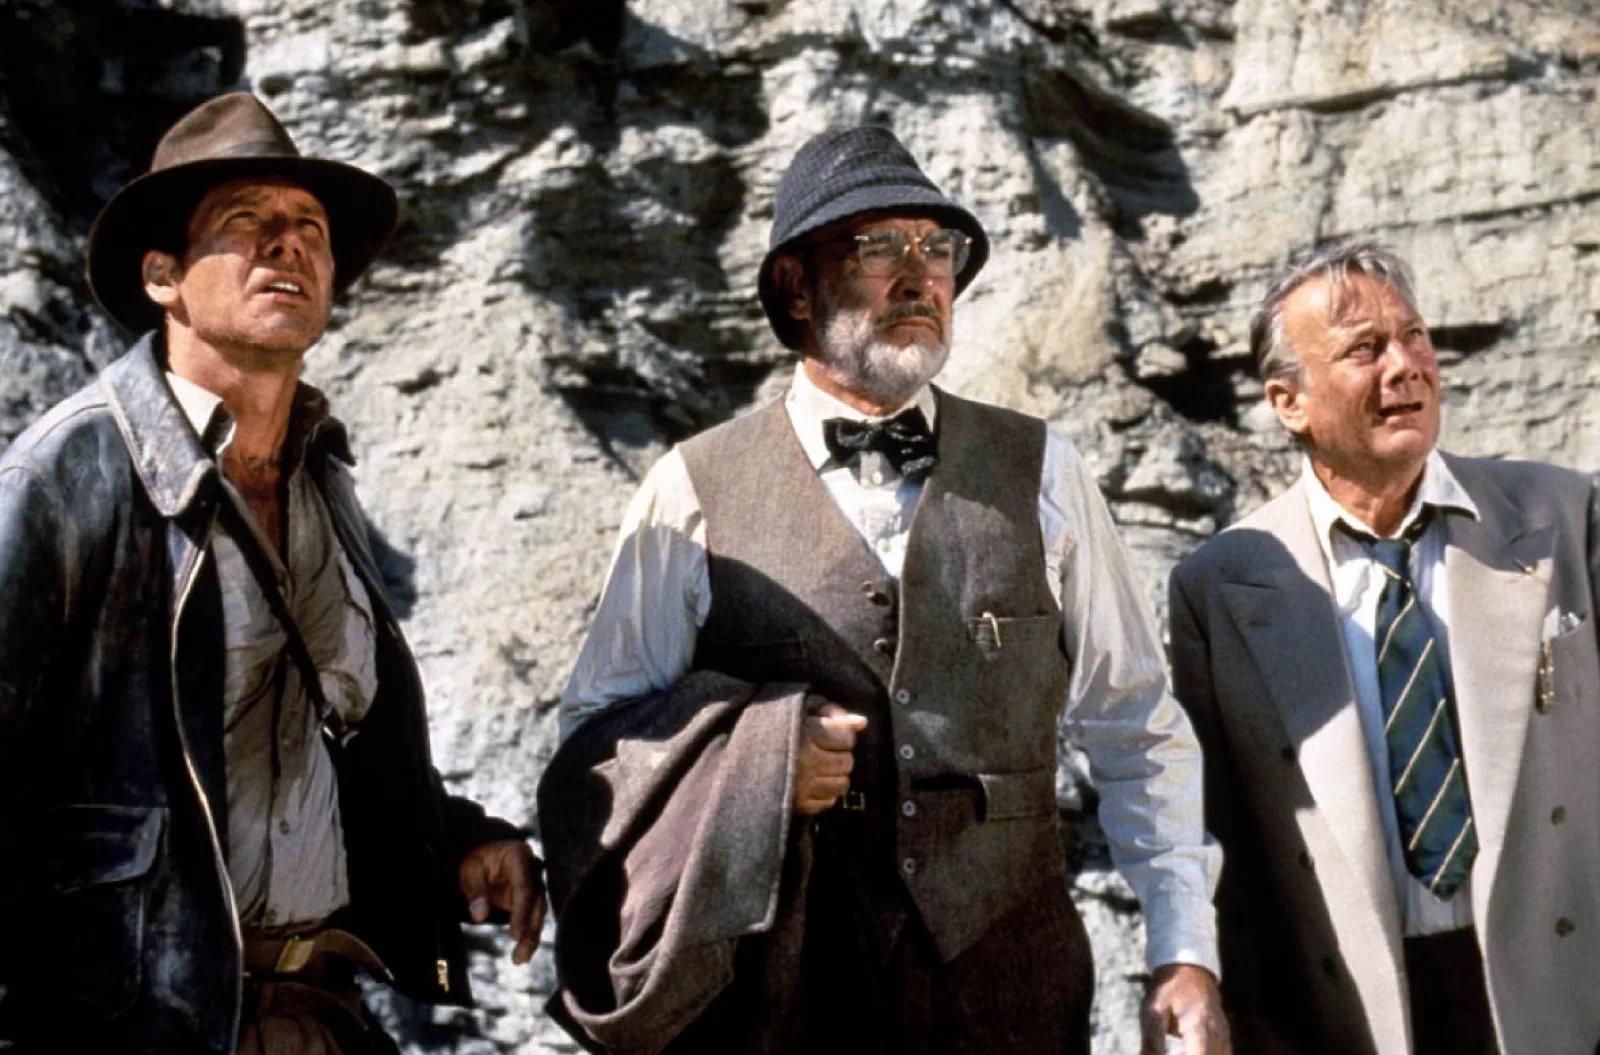 Indiana Jones: The Last Crusade (1989)